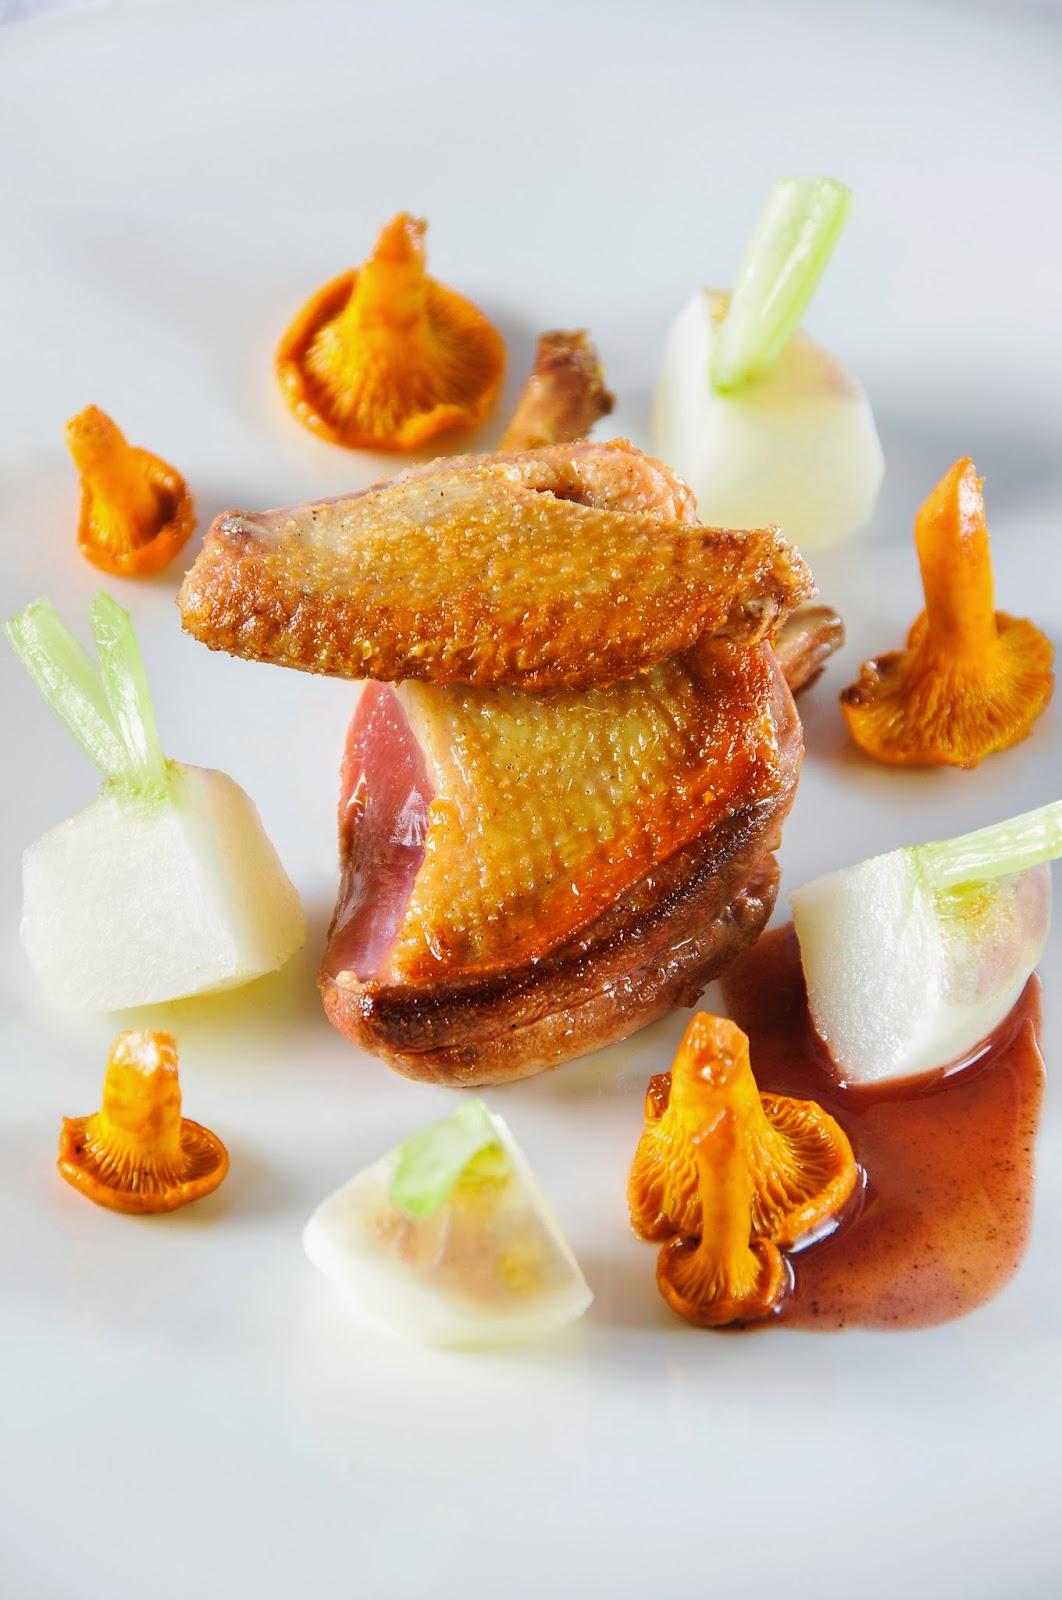 http://www.chateaubellevue.org/fr/restaurant/carte-et-menus